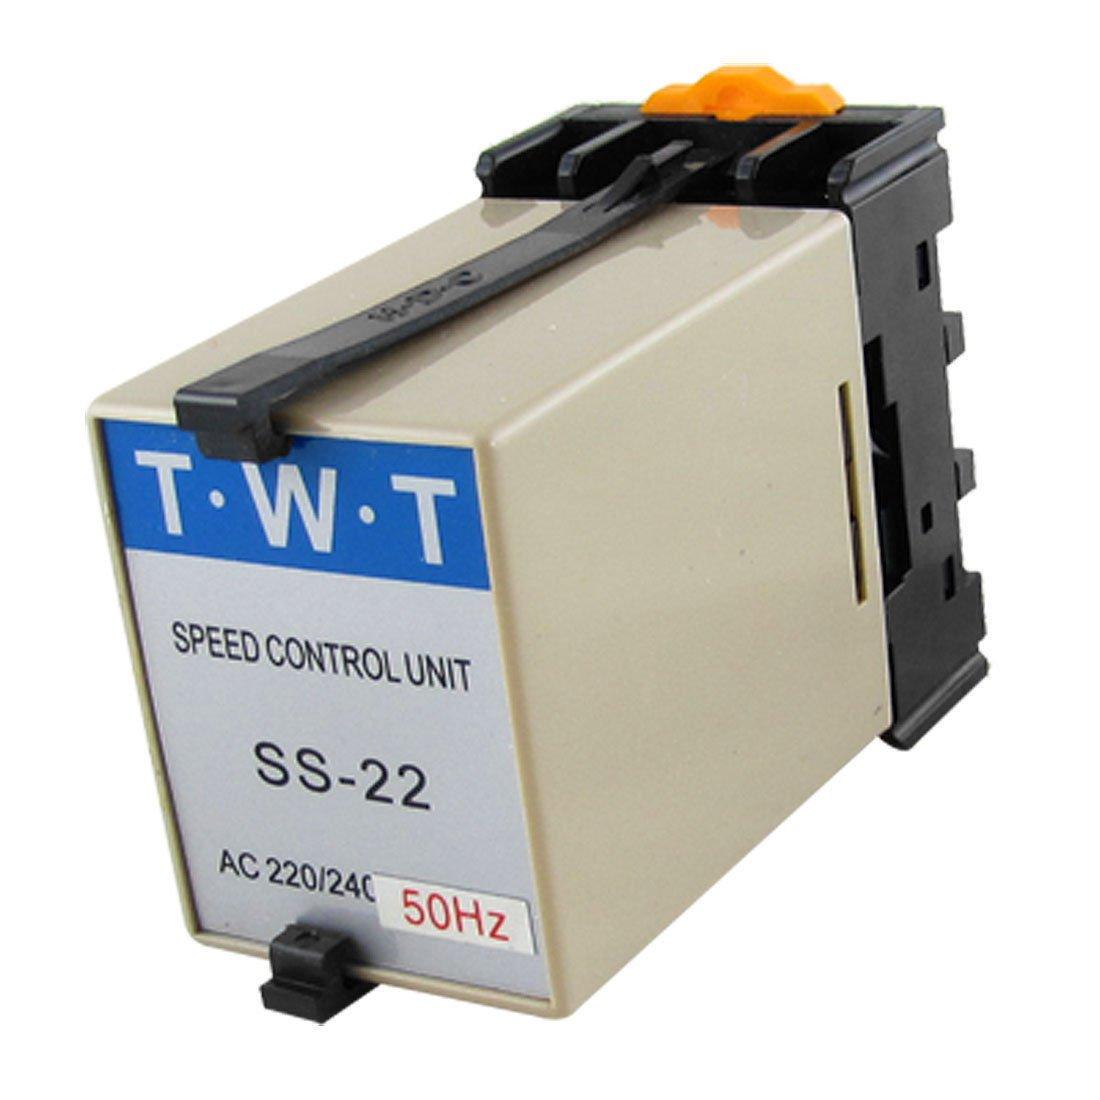 AC 220V/240V Motor Speed Controller Switch w 20K Ohm Potentiometer SS-22